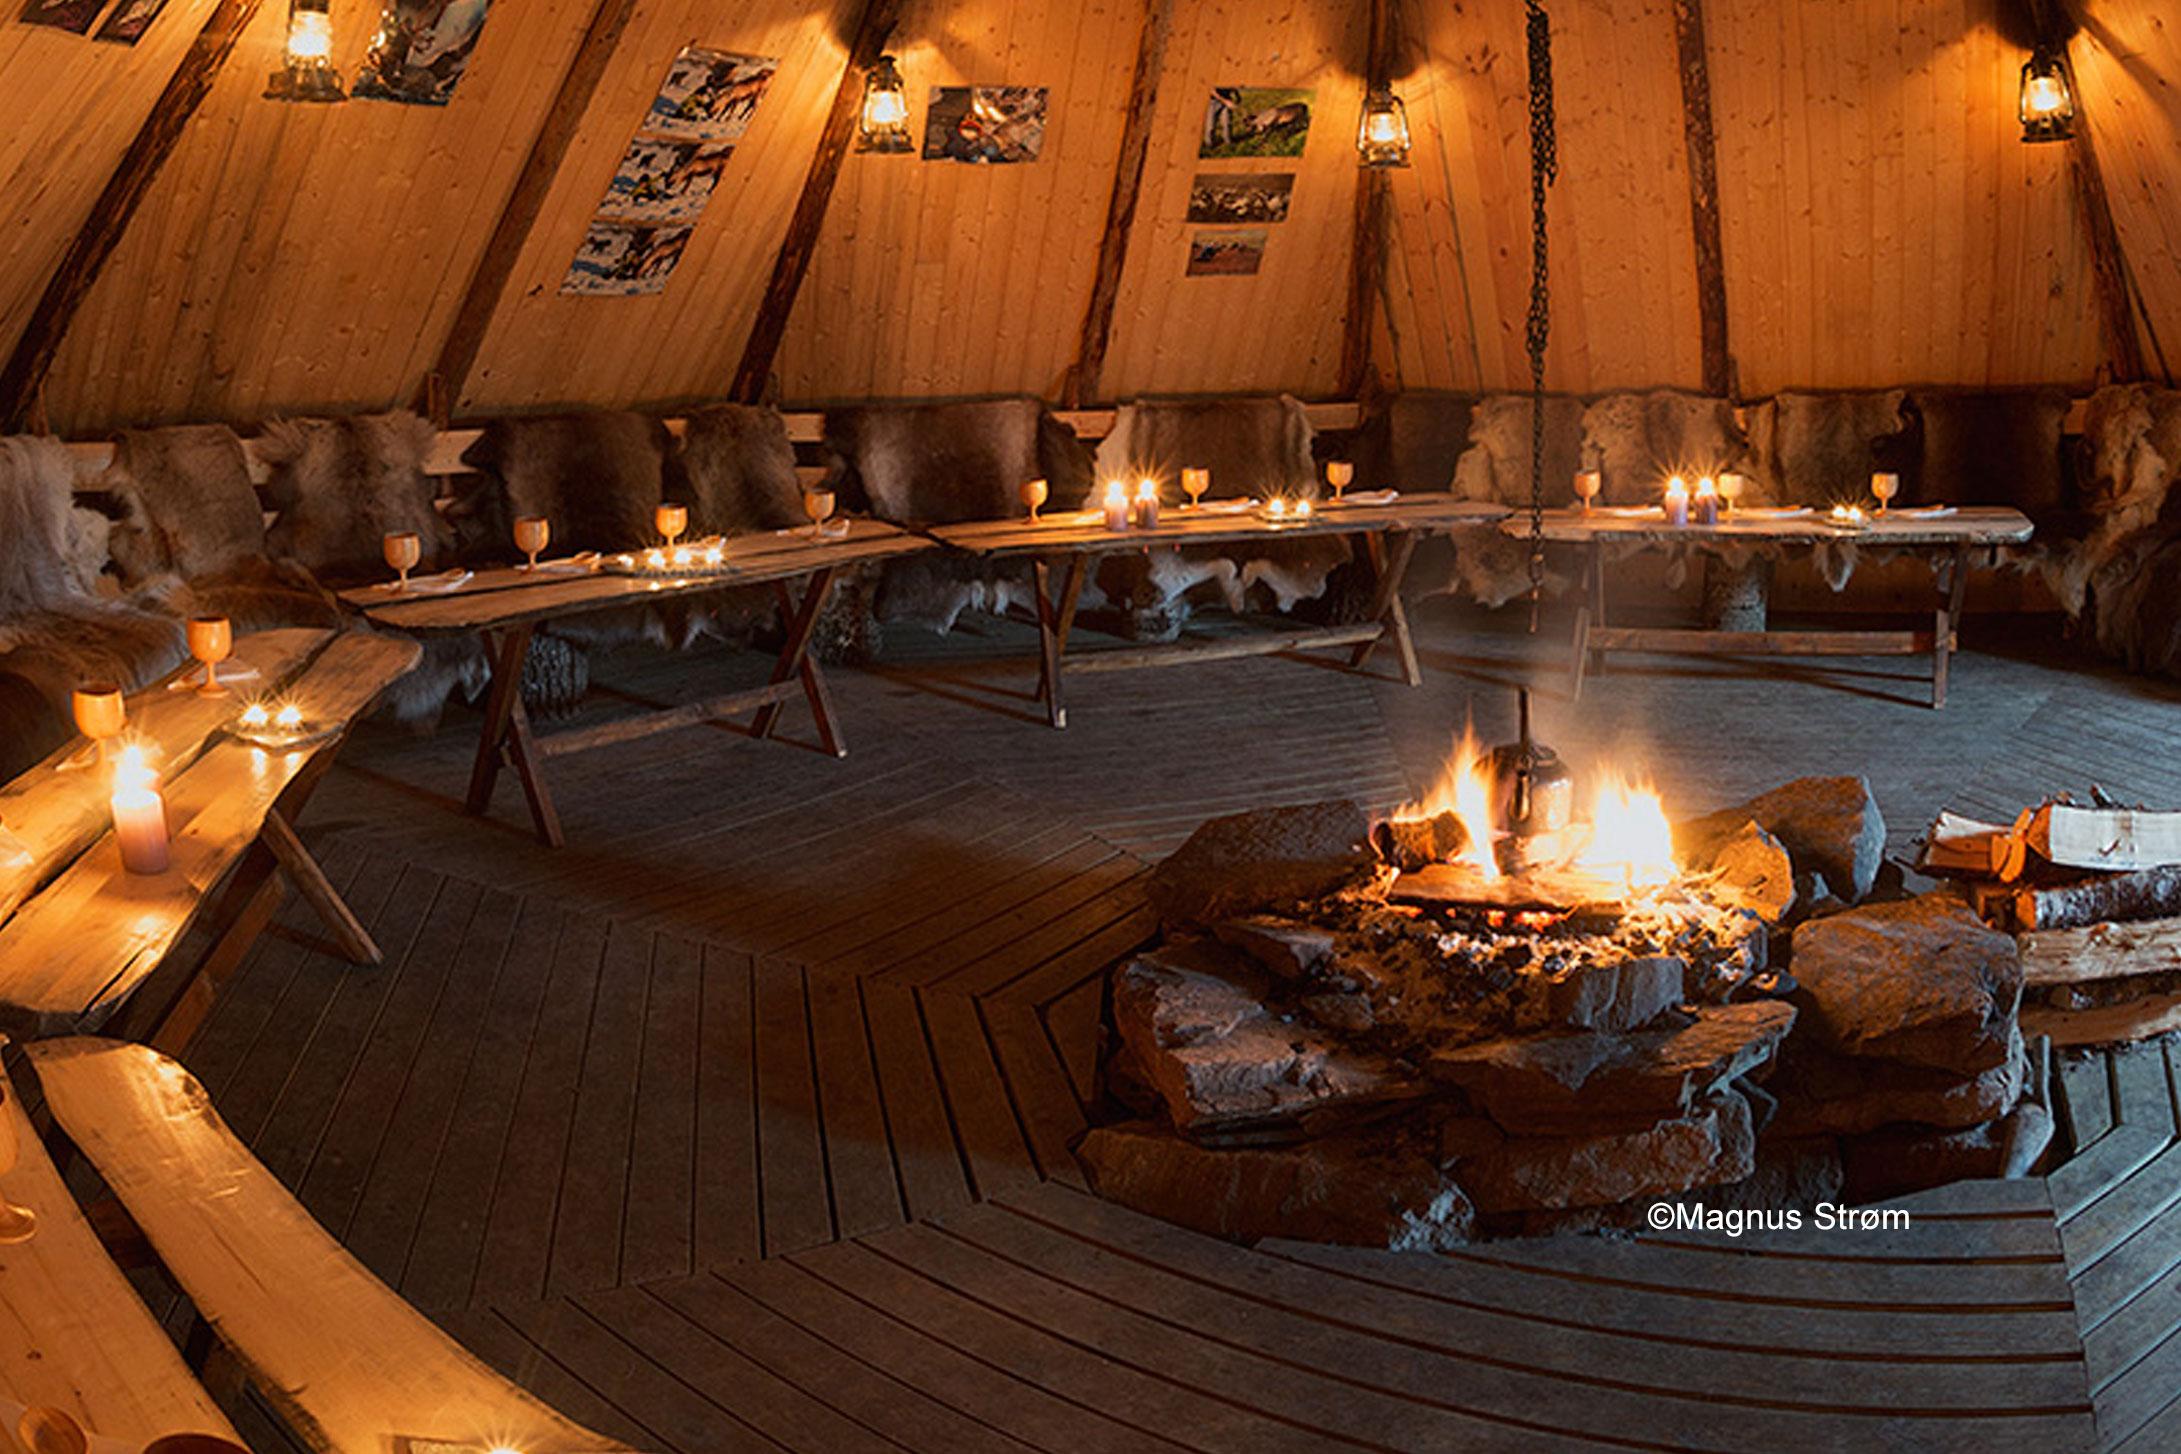 Sami Culture & A Reindeer Encounter